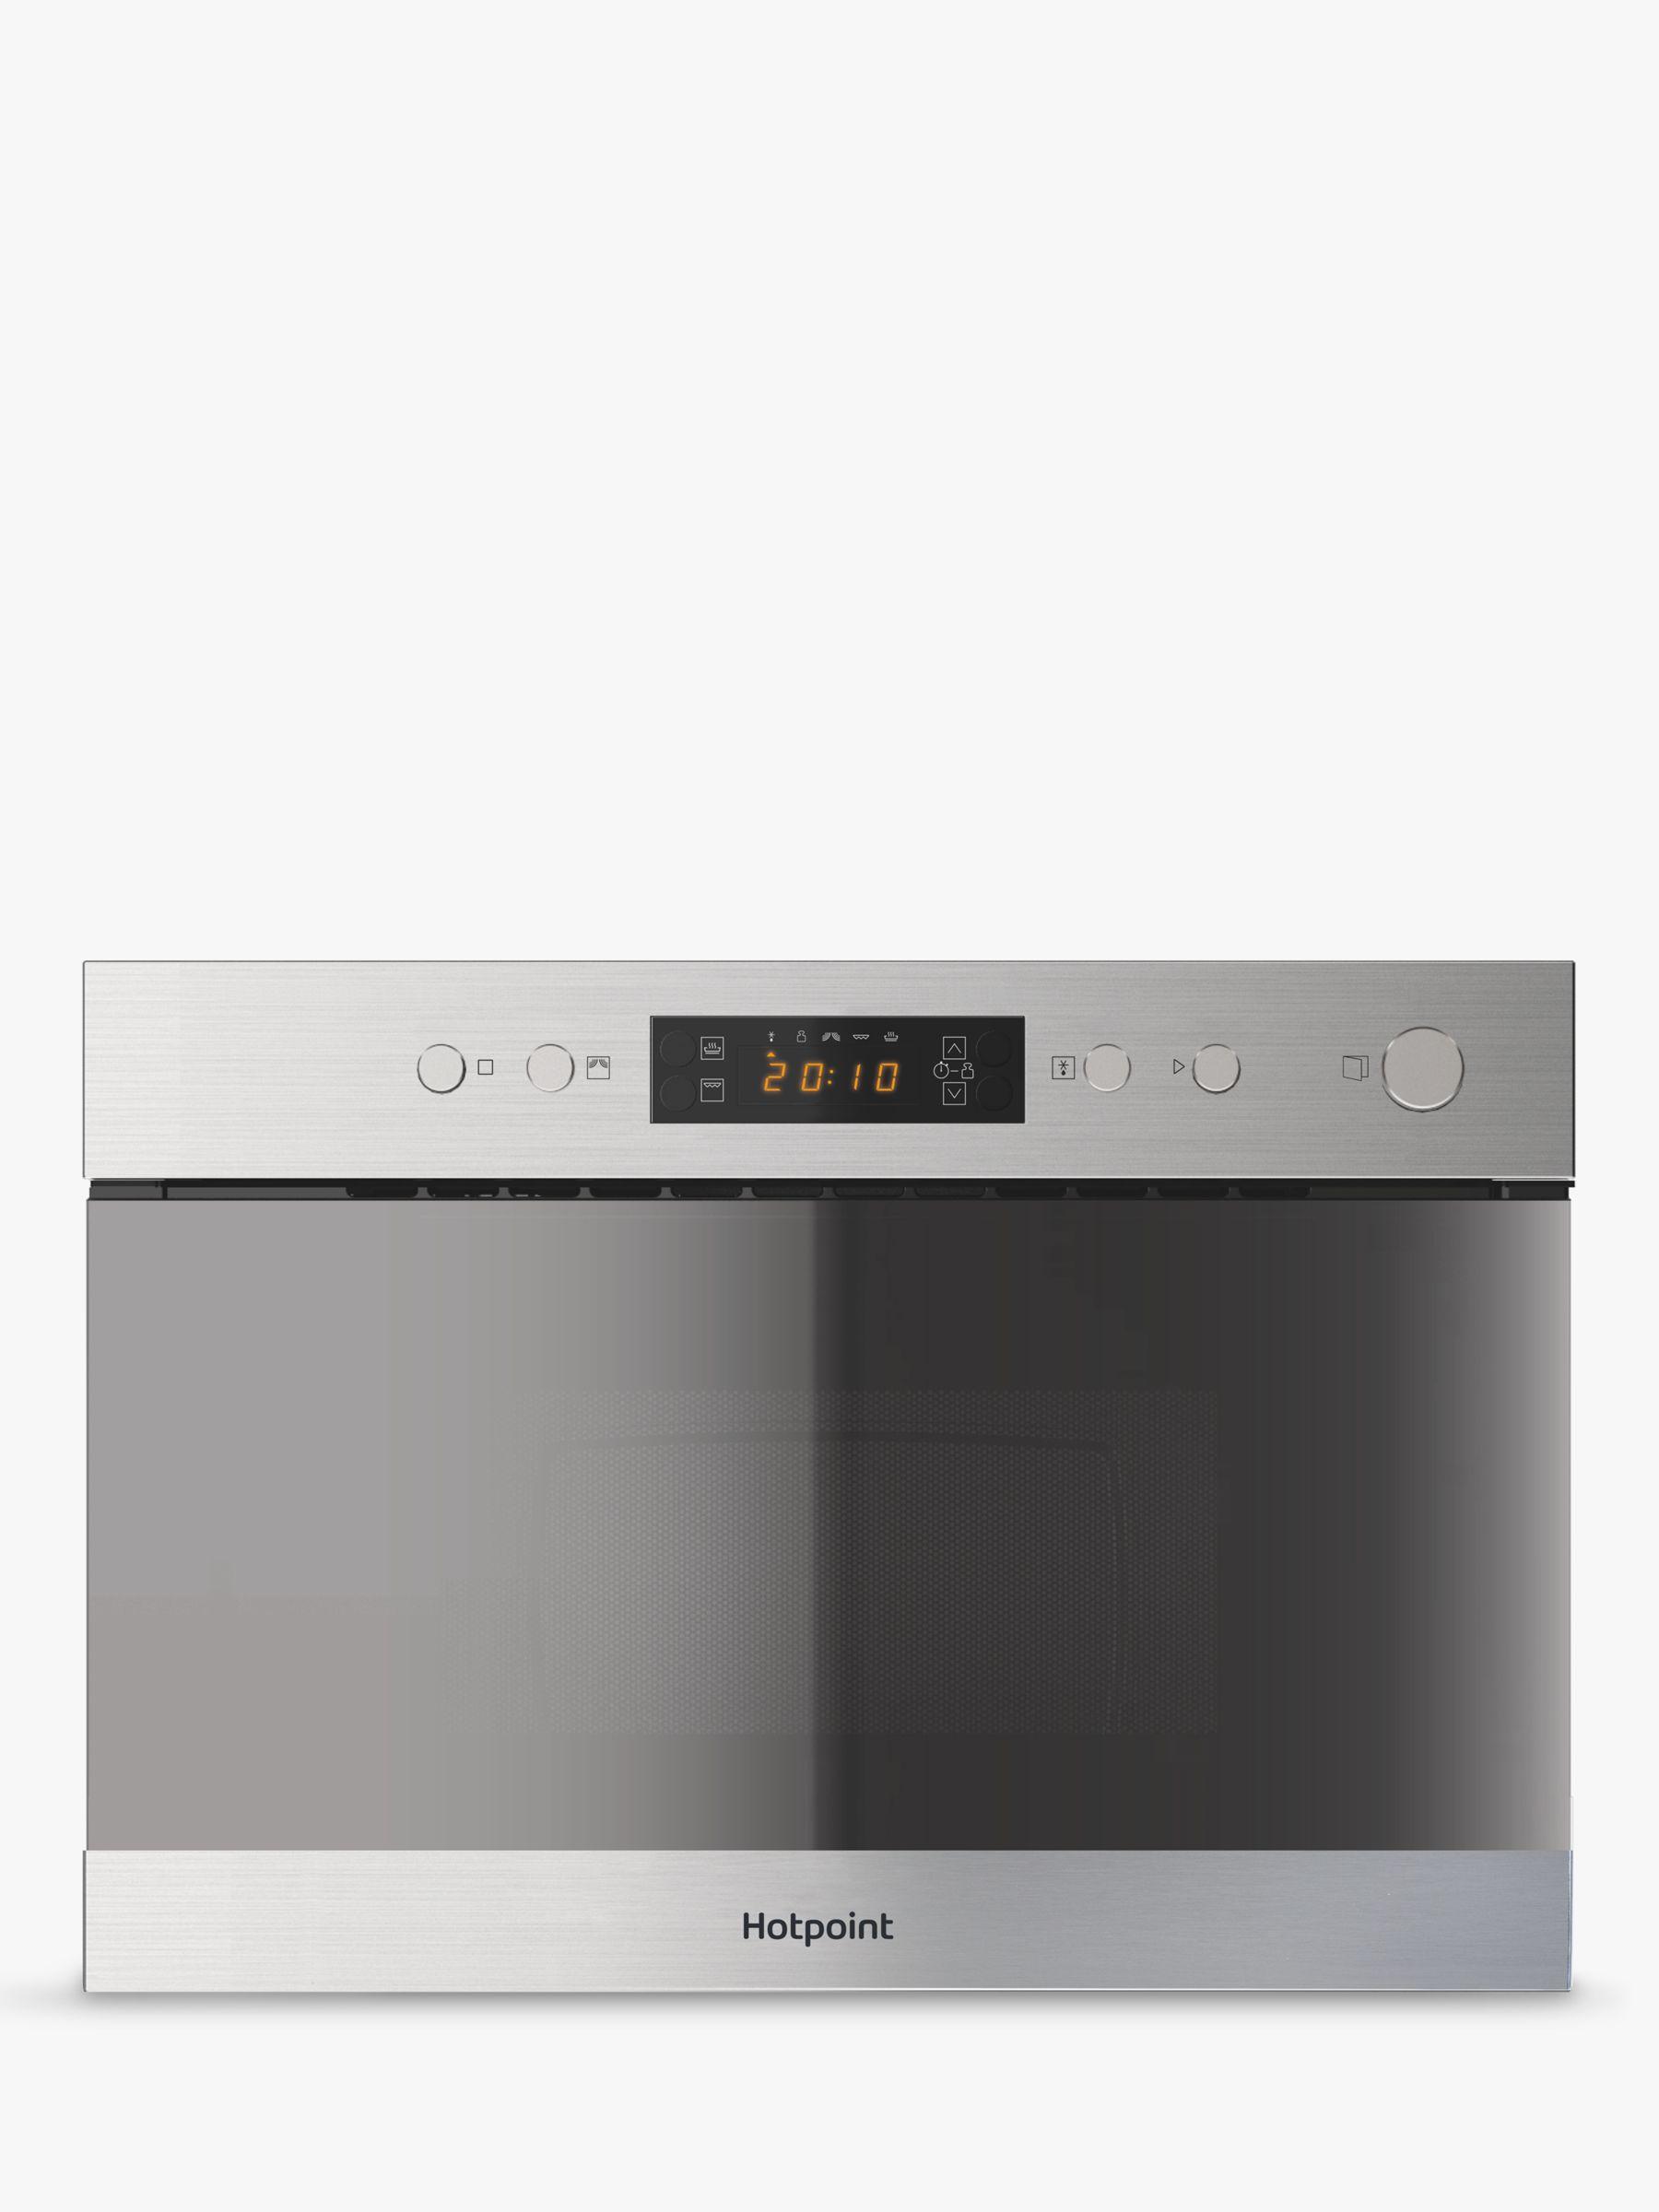 WRG-9424] Hotpoint Microwave Wiring Diagram on